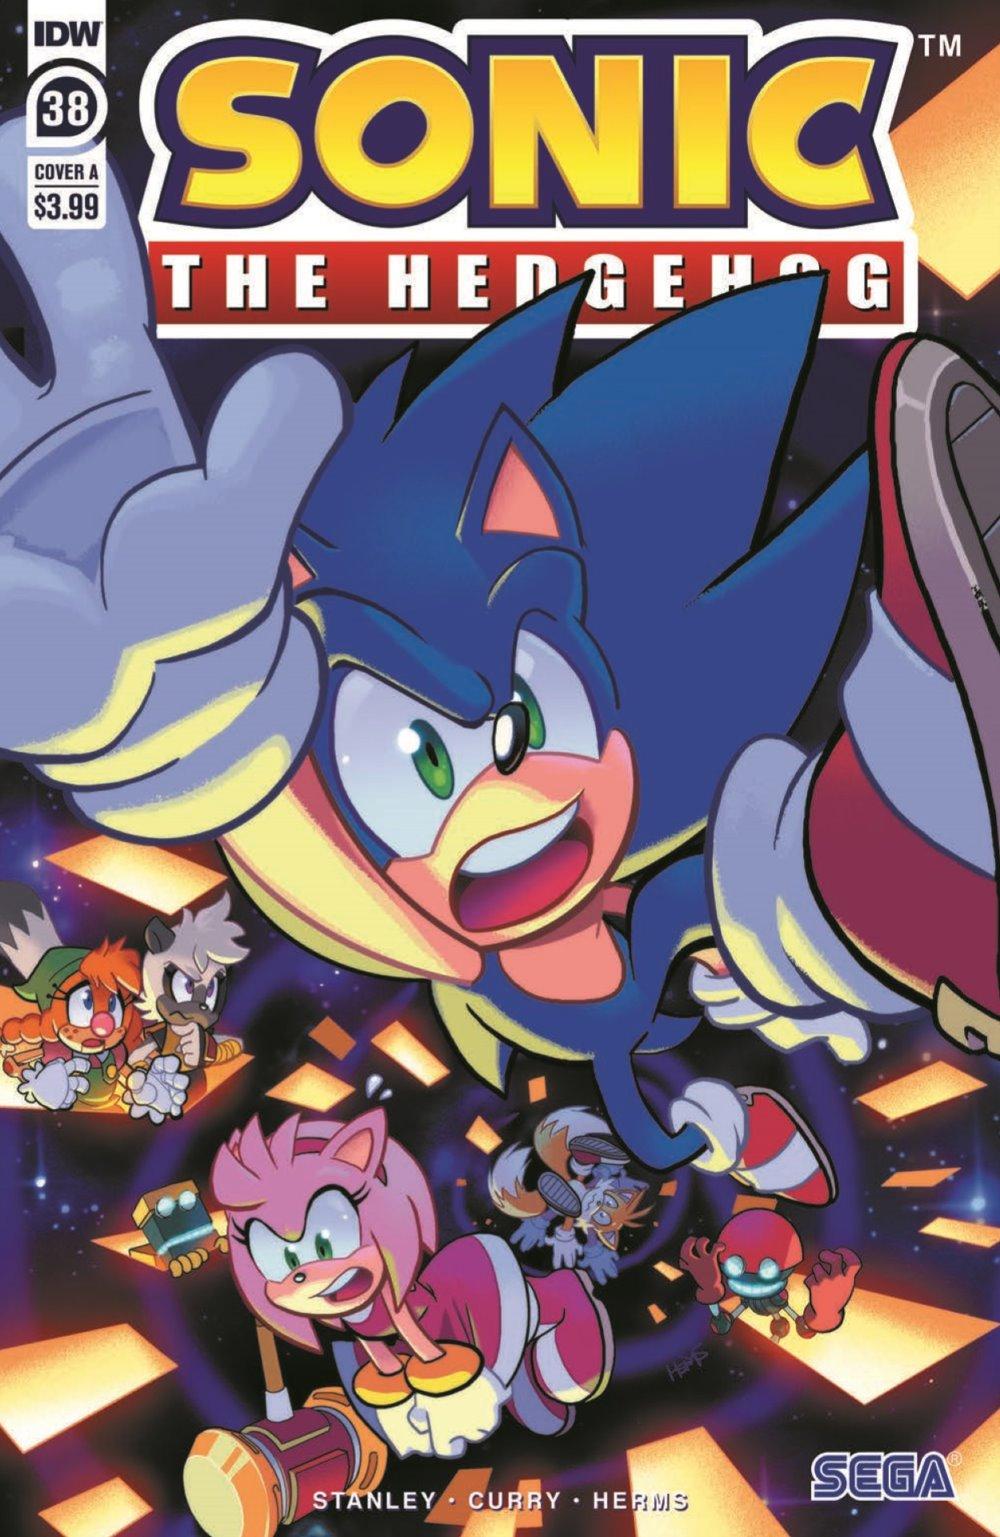 STH38_pr-1 ComicList Previews: SONIC THE HEDGEHOG #38